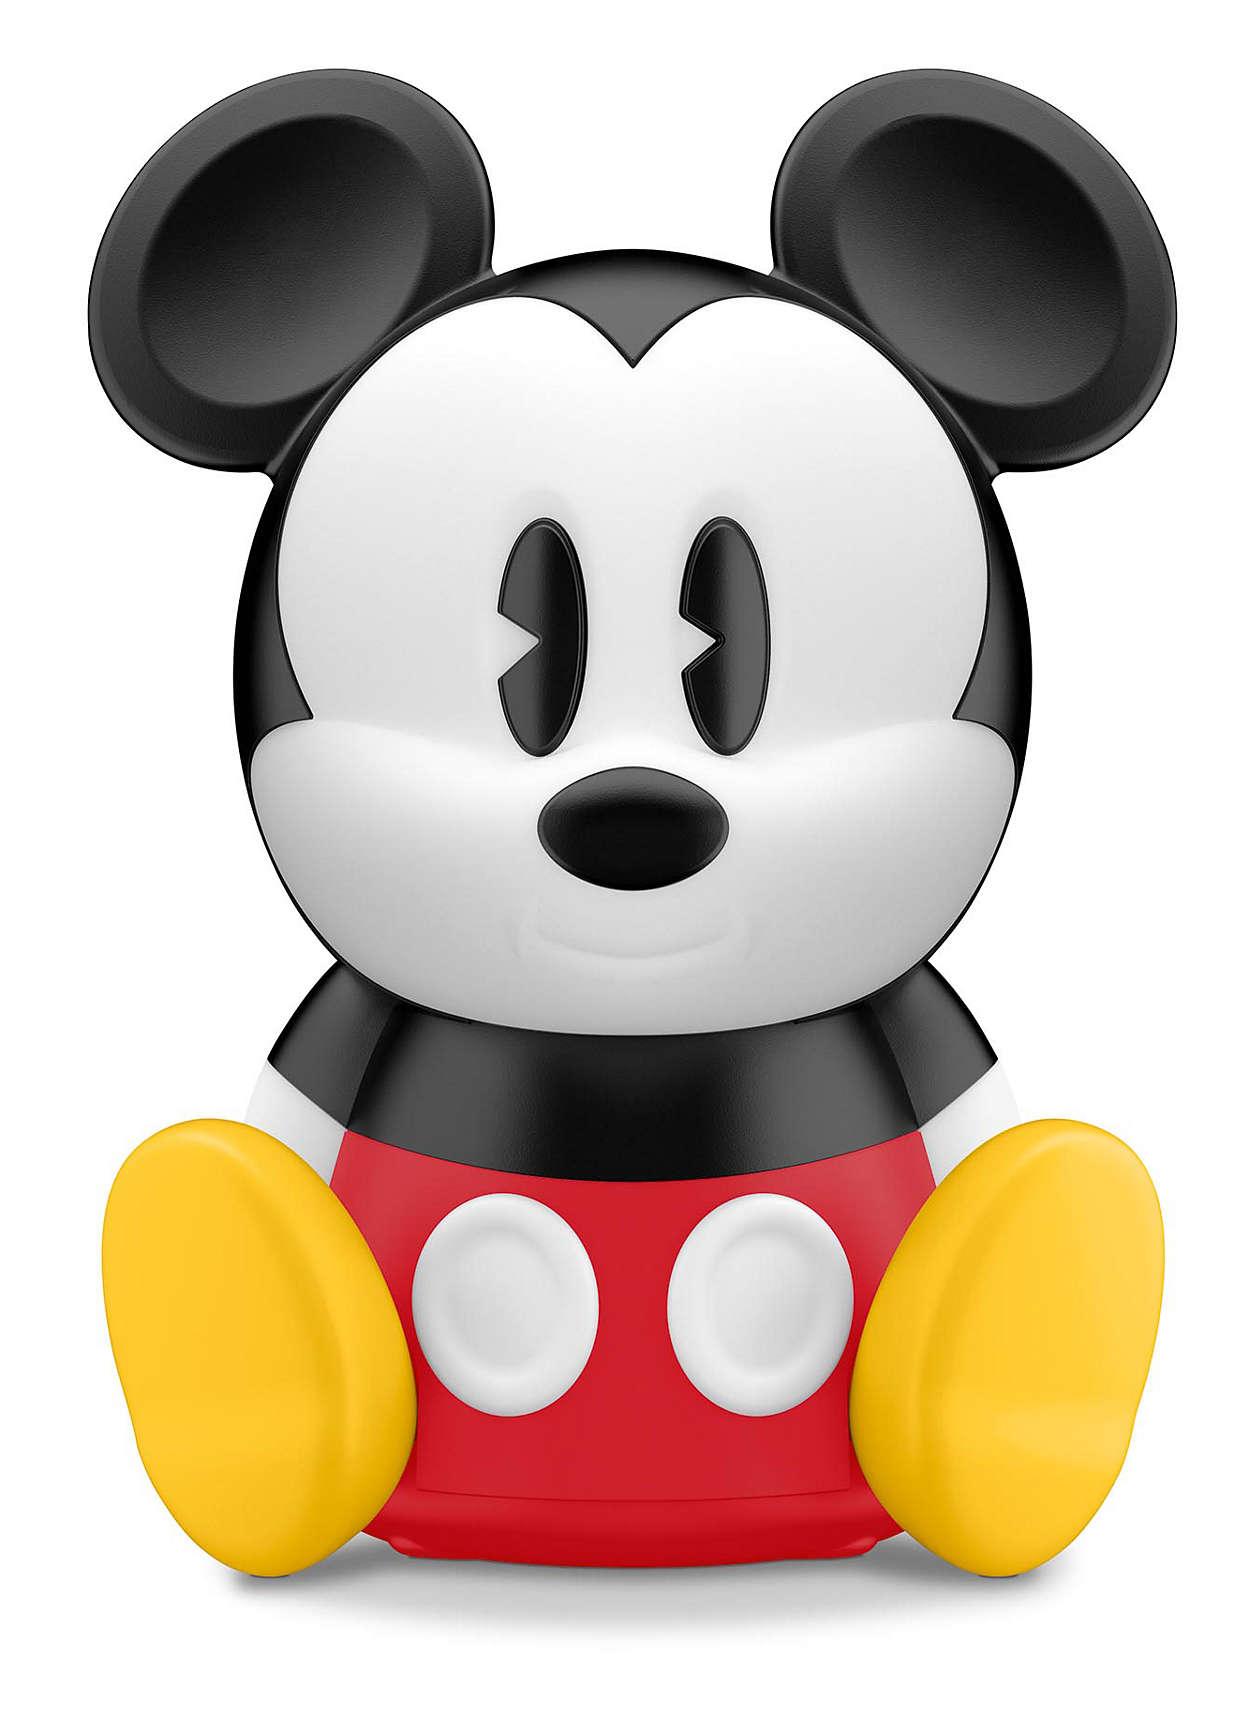 Imagination clipart lamp On 717015516 Table Imagination Disney